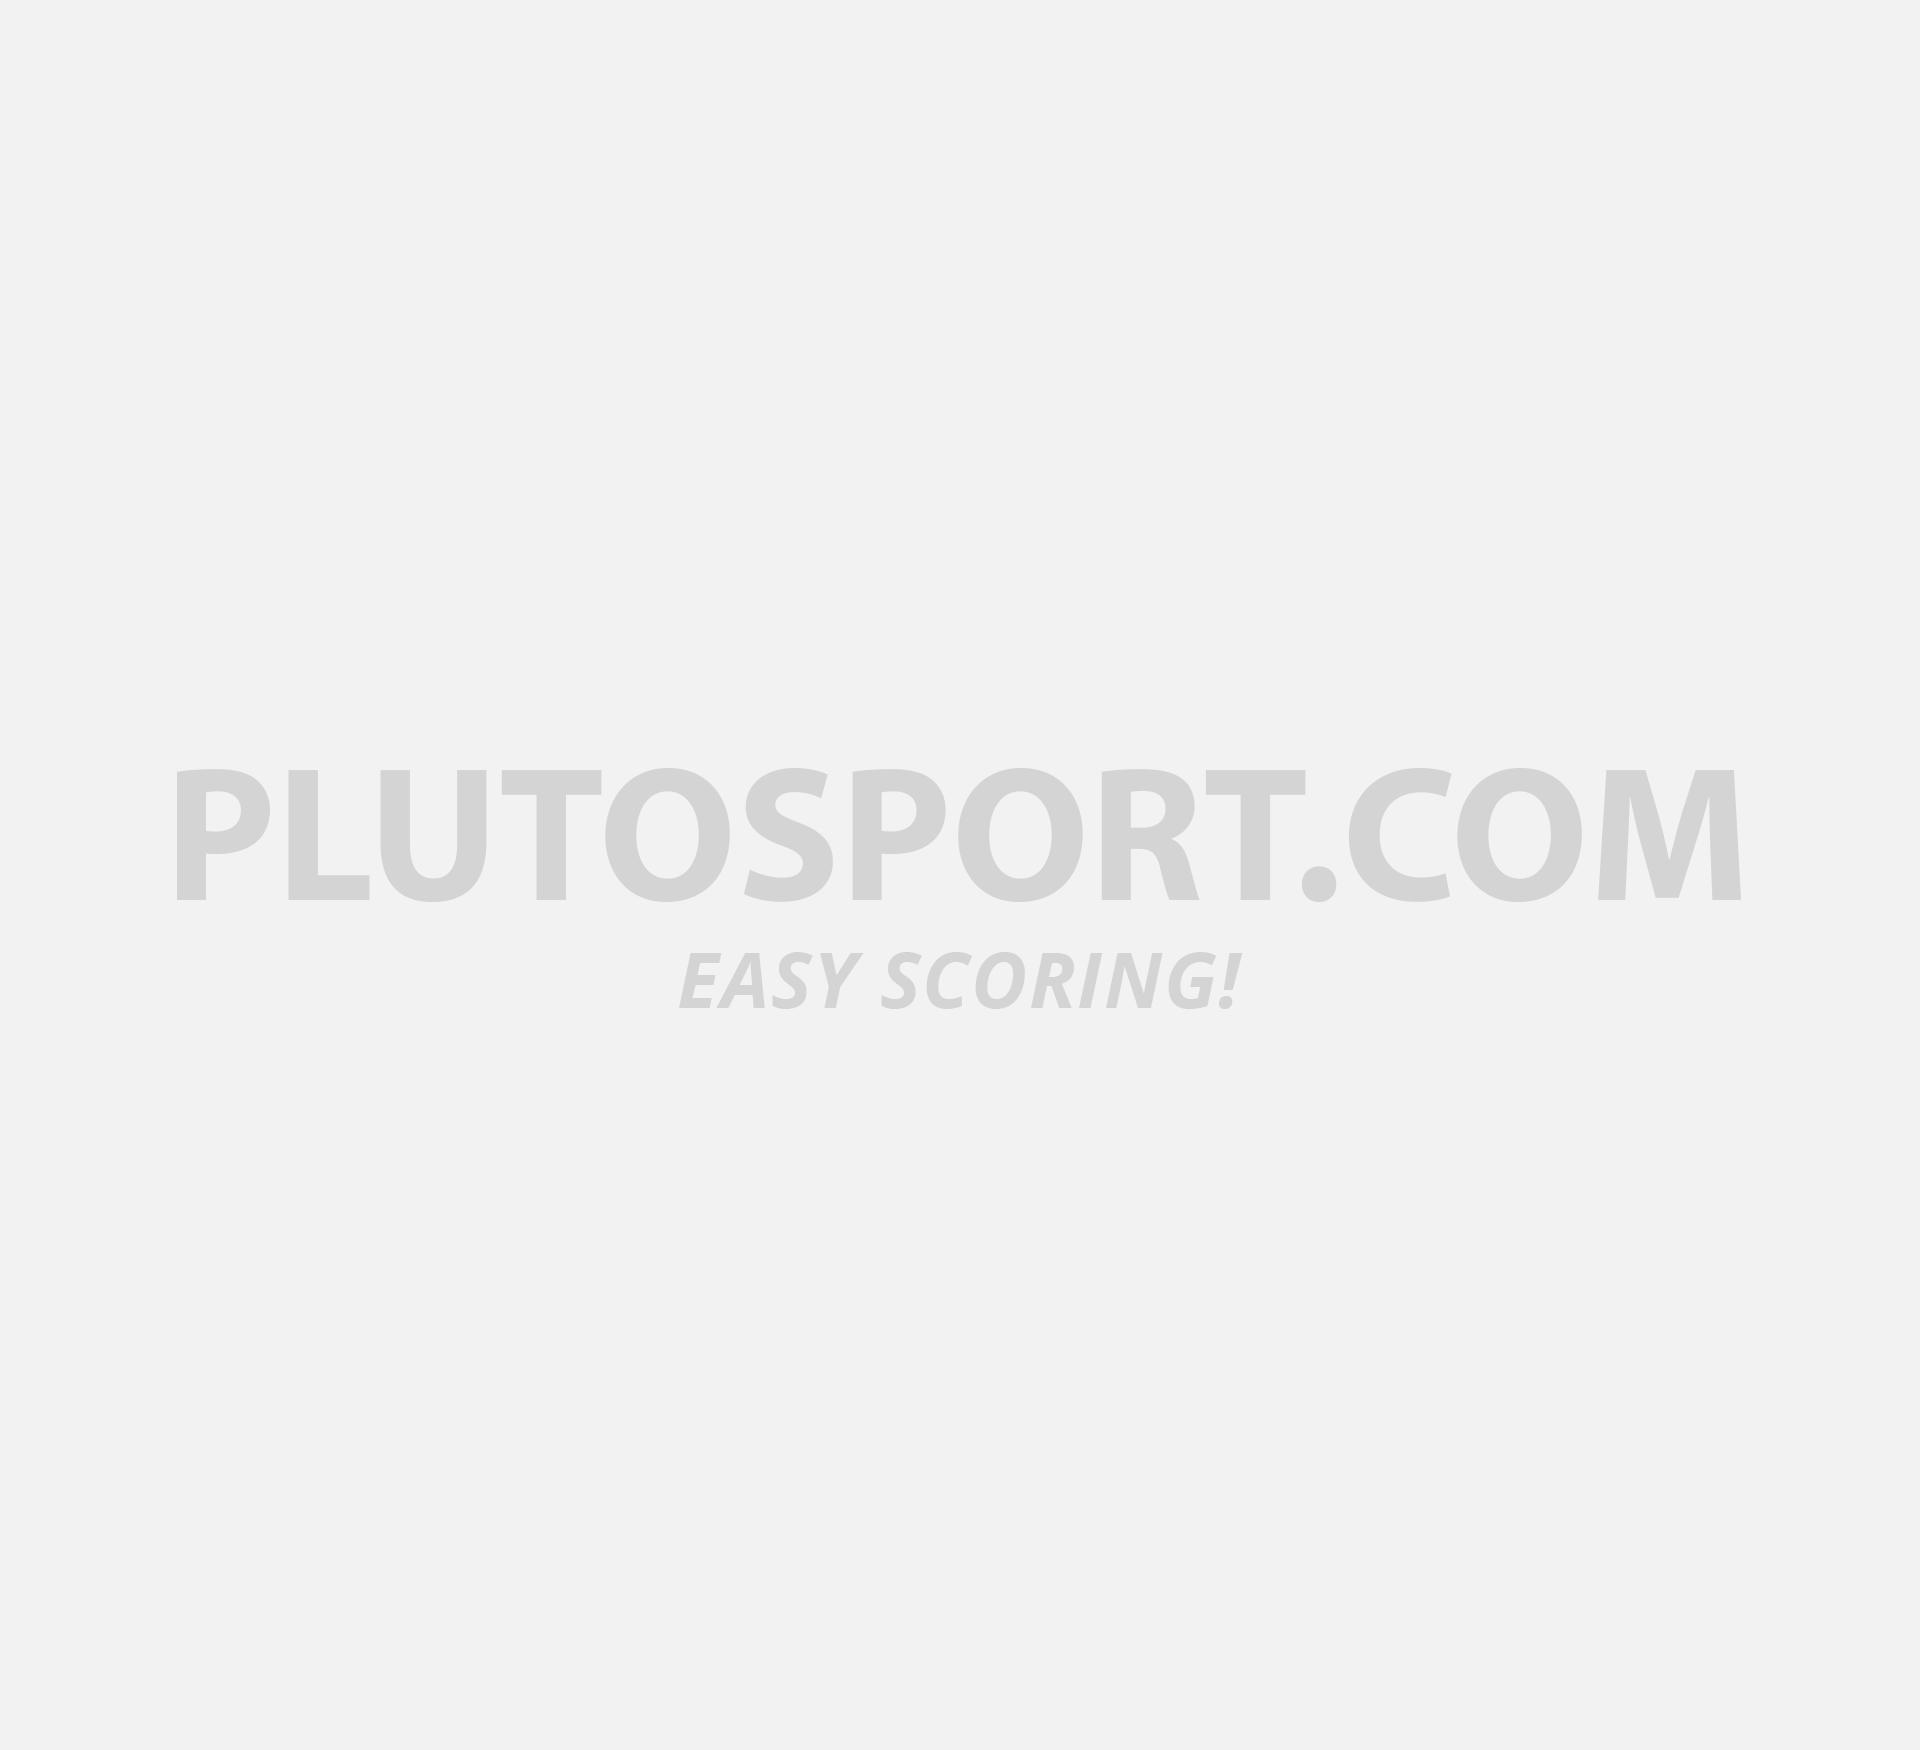 d7fa3f97d Lacoste Men's Sport Bicolor Tennis Polo Roland Garros - Polo shirts -  Clothing - Tennis - Sports   Plutosport